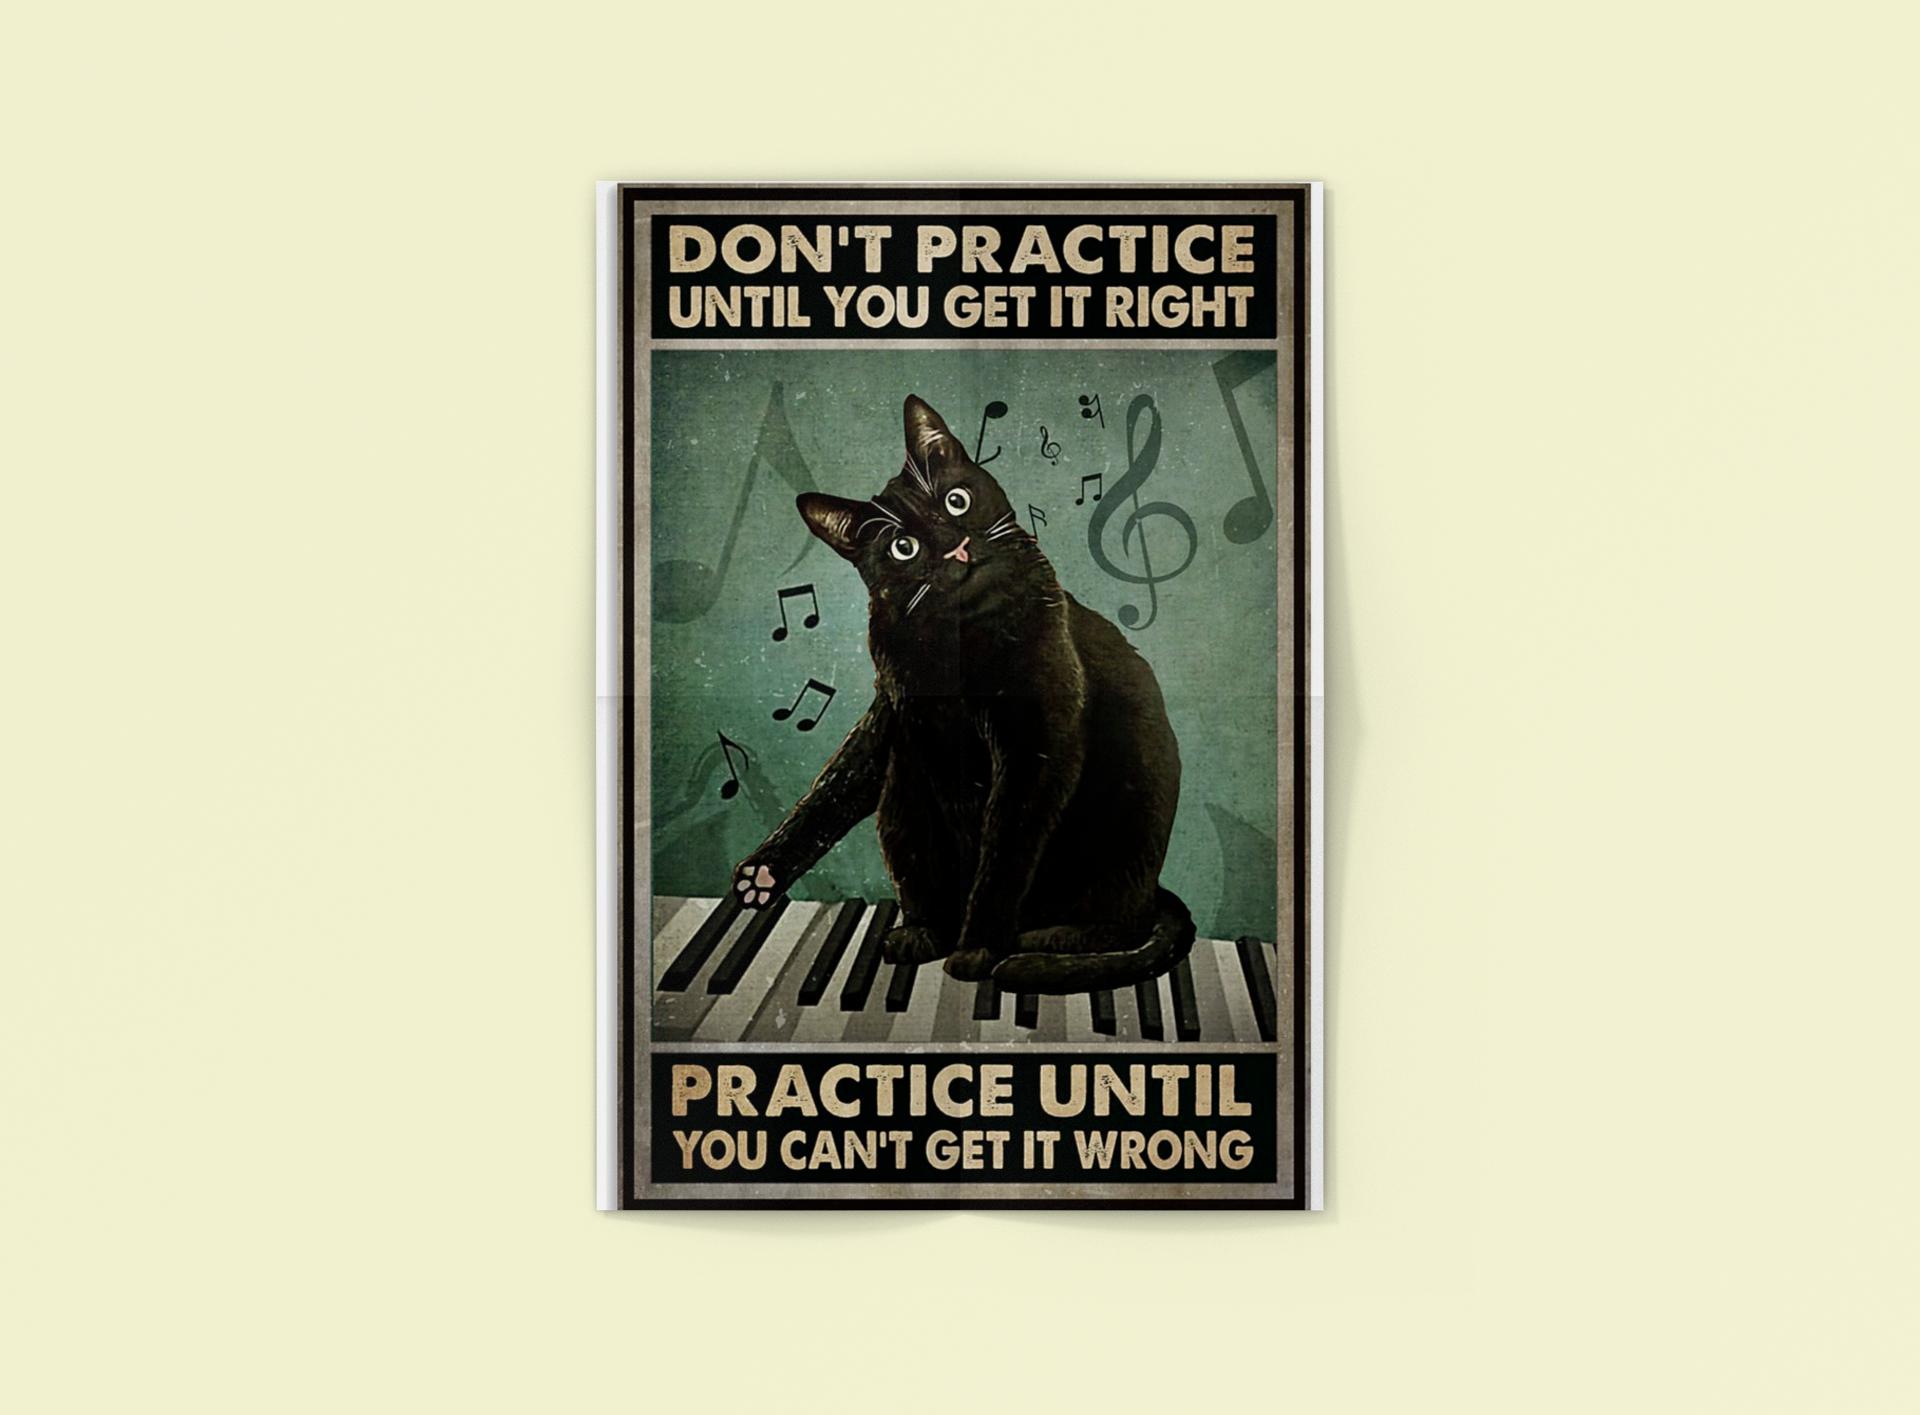 Poster Cat Don't practice until you get it right practice until you can't get it wrong 13